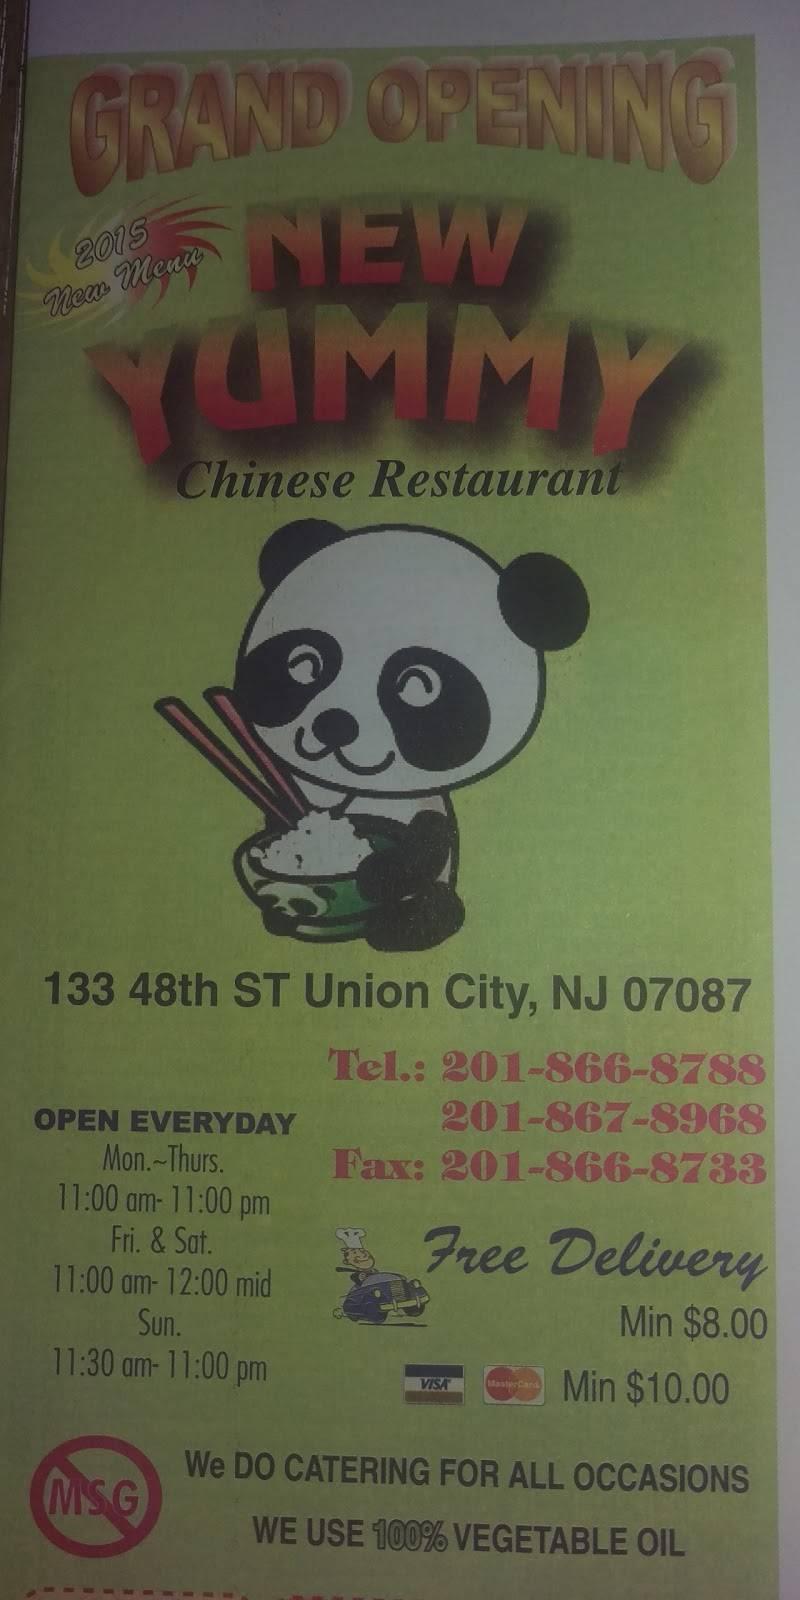 New Yummy Restaurant | restaurant | 133 48th St, Union City, NJ 07087, USA | 2018668788 OR +1 201-866-8788